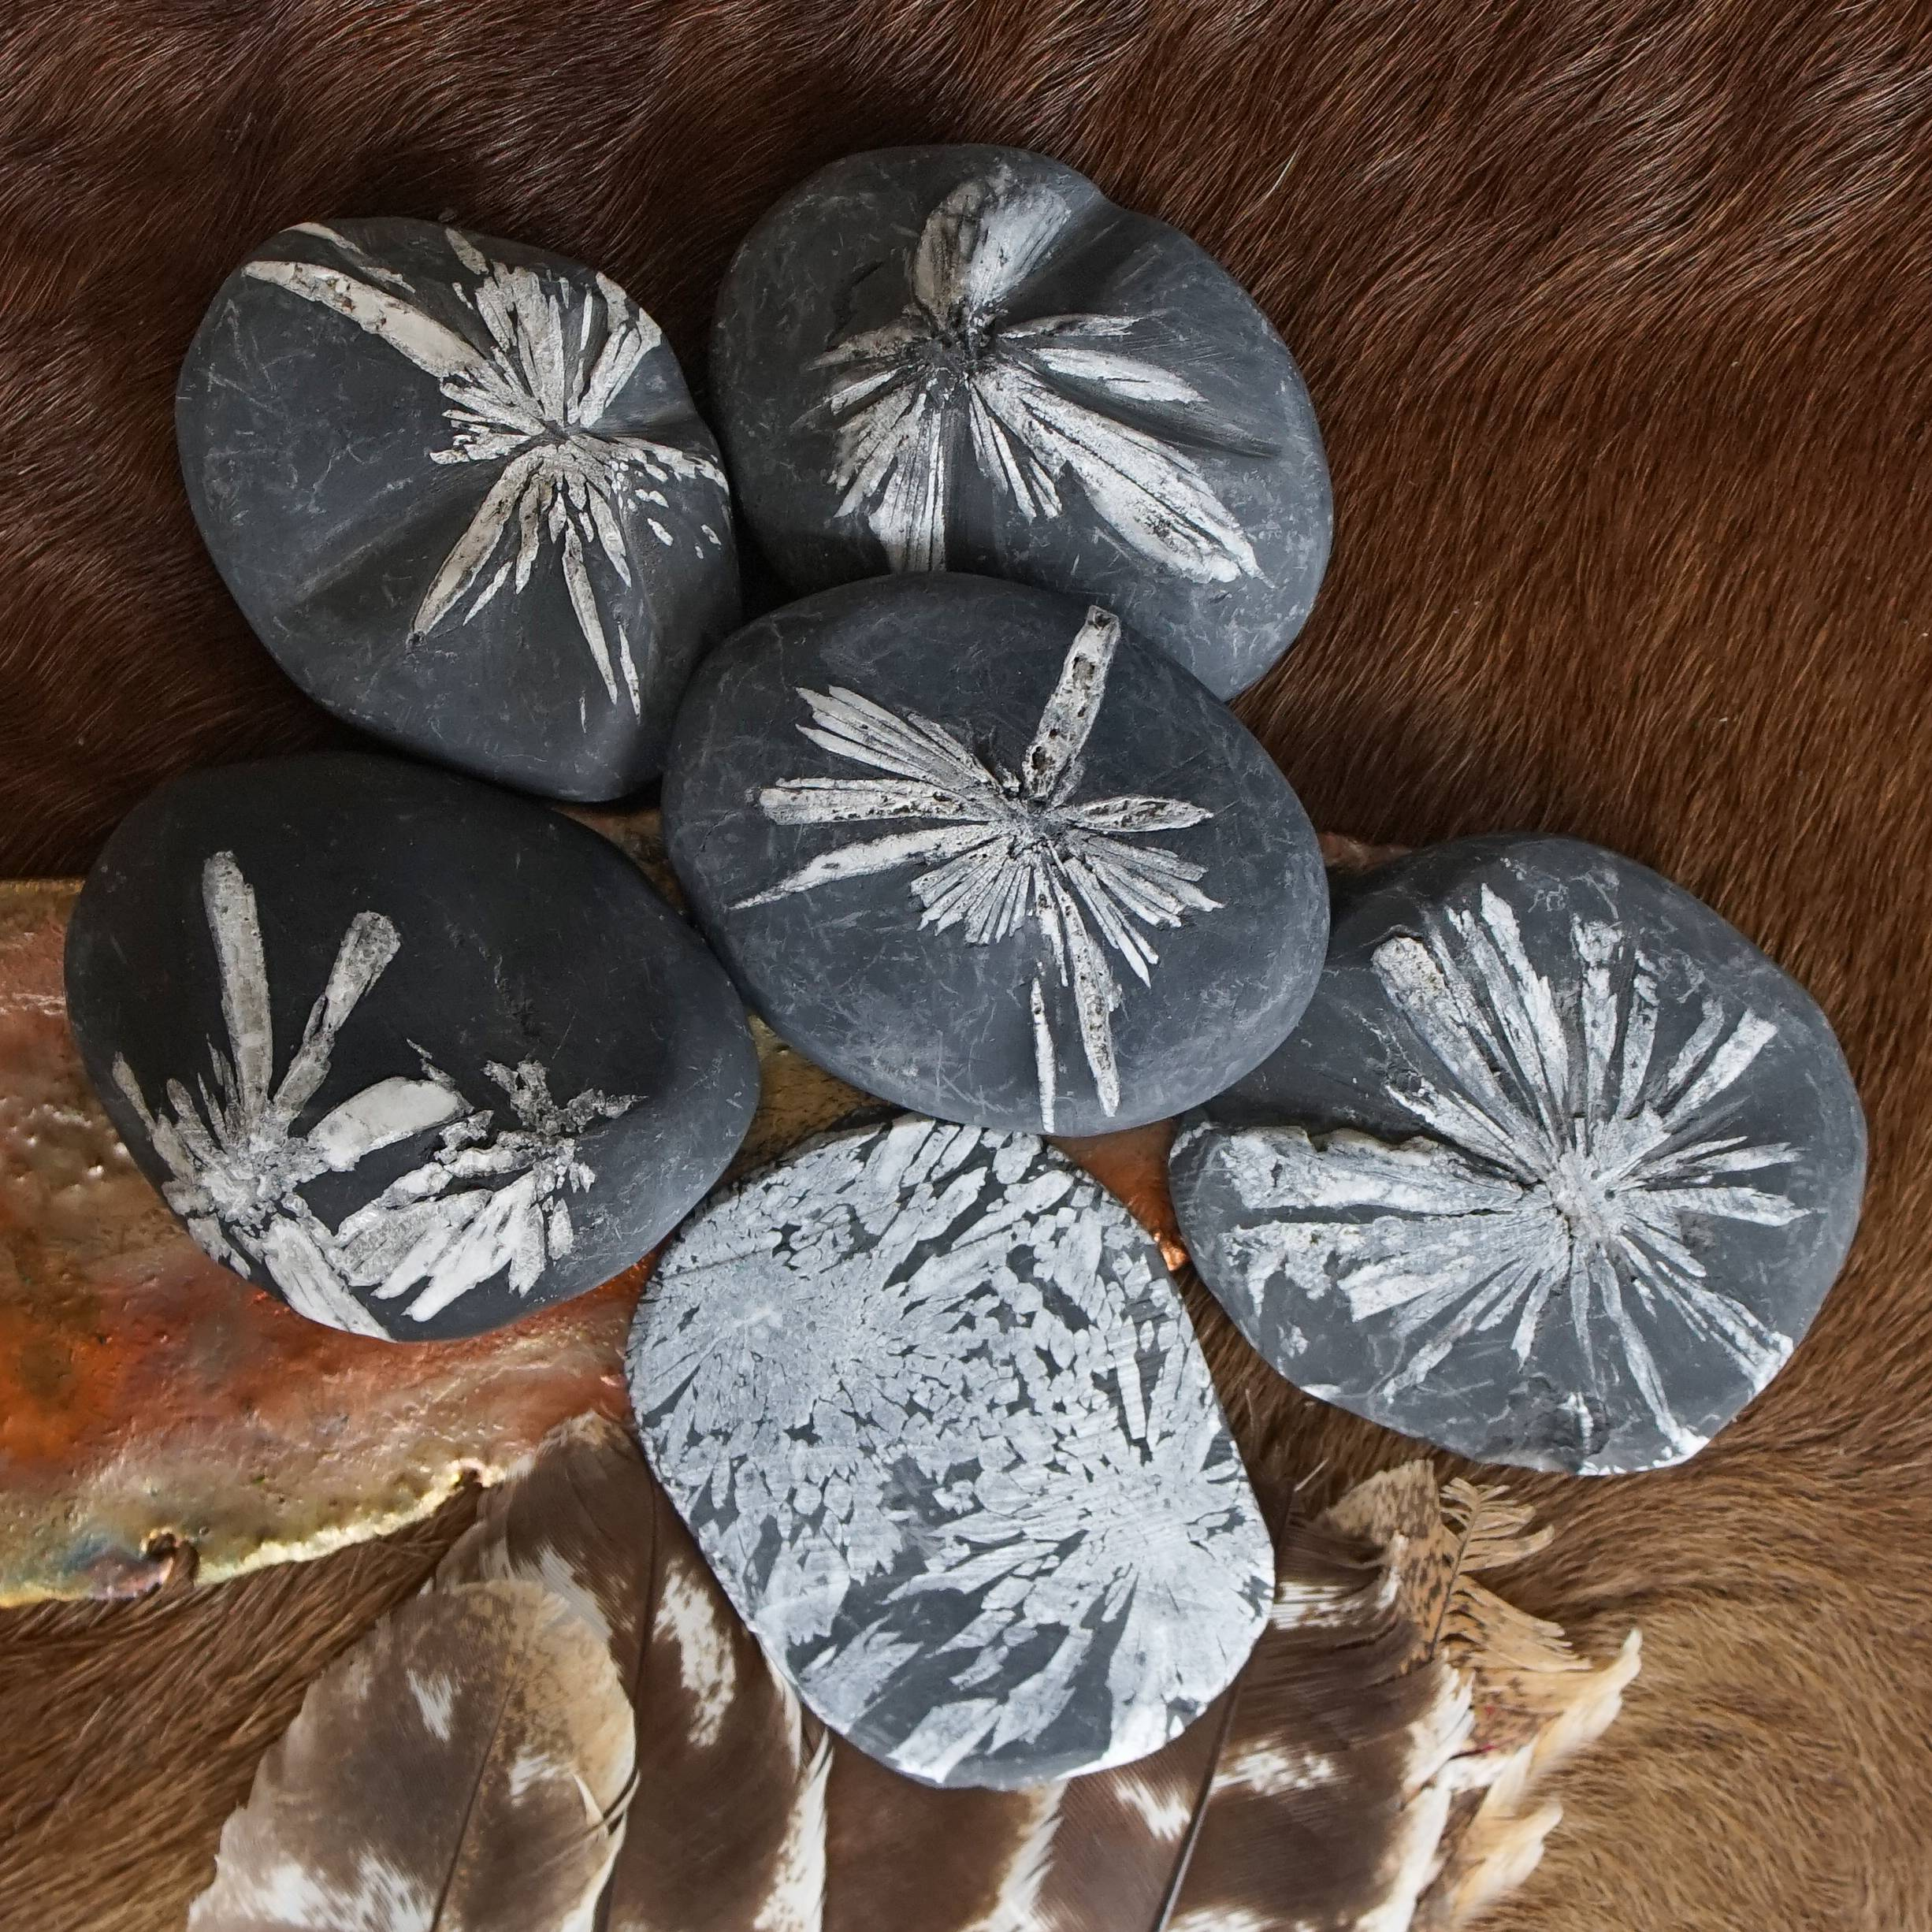 chrysanthemum palm stones